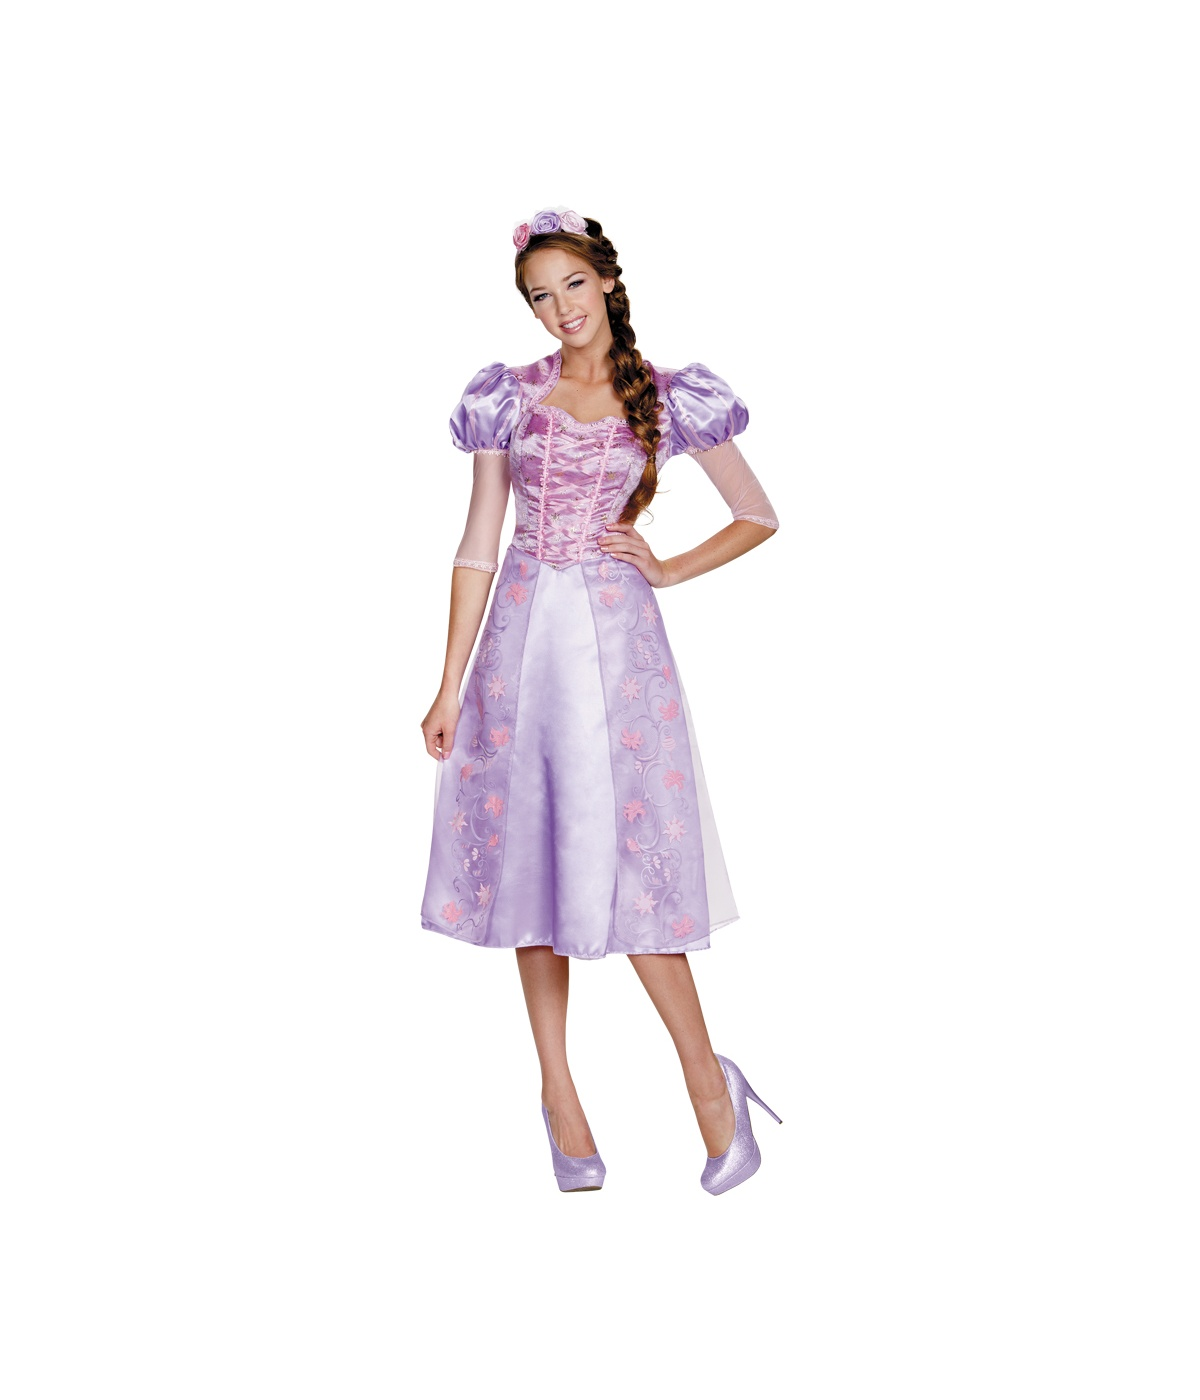 Disney princess rapunzel womens dress costume princess - Costume princesse disney adulte ...